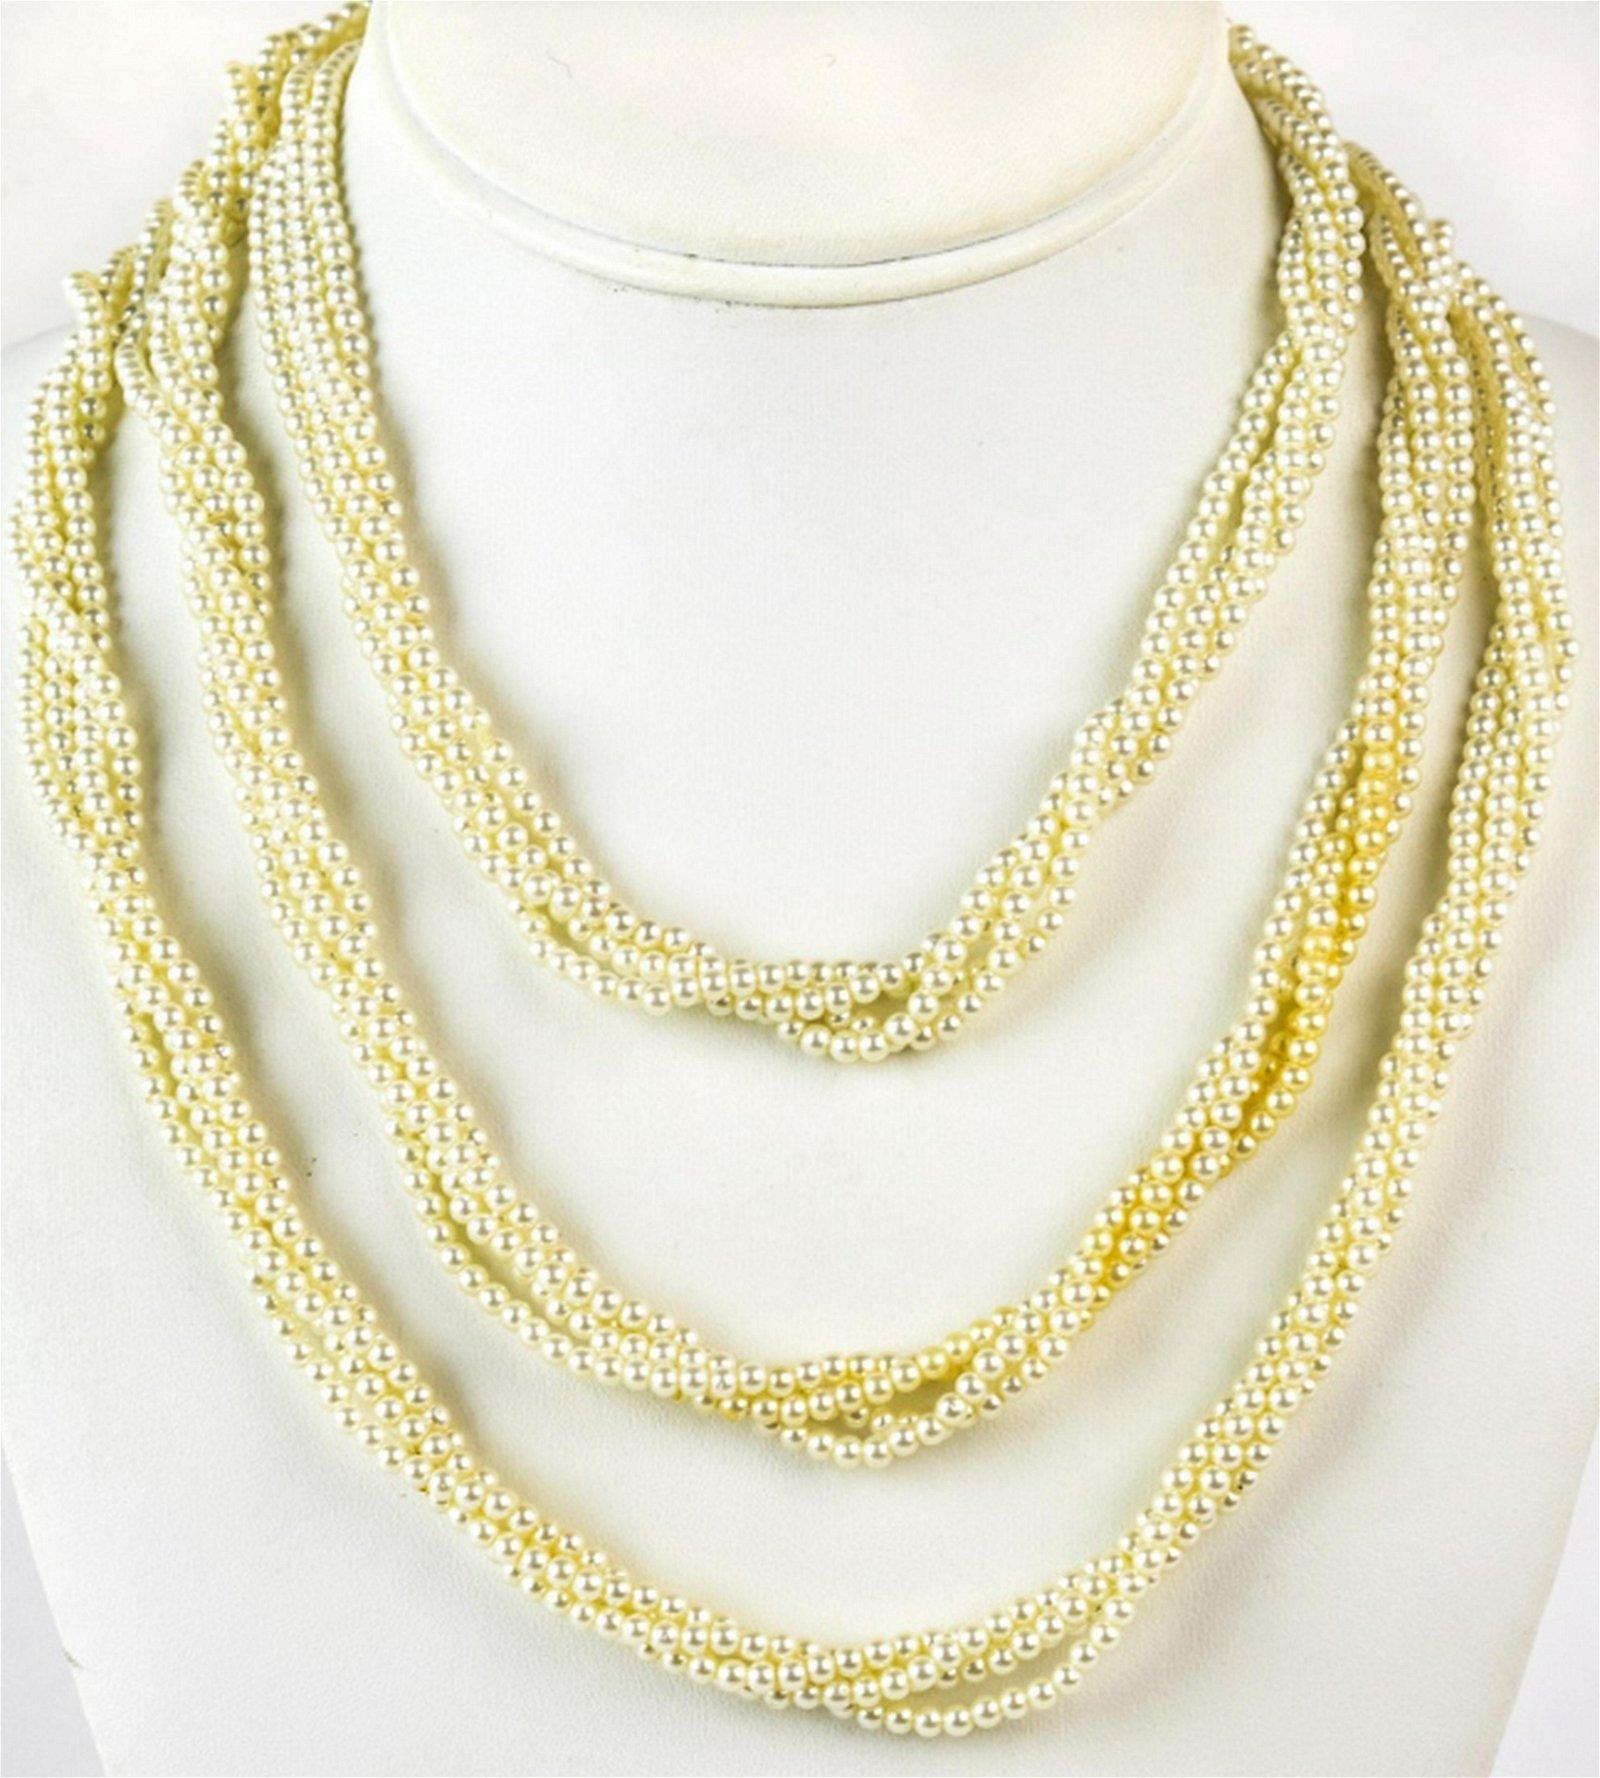 Antique Four Strand Faux Pearl Necklace